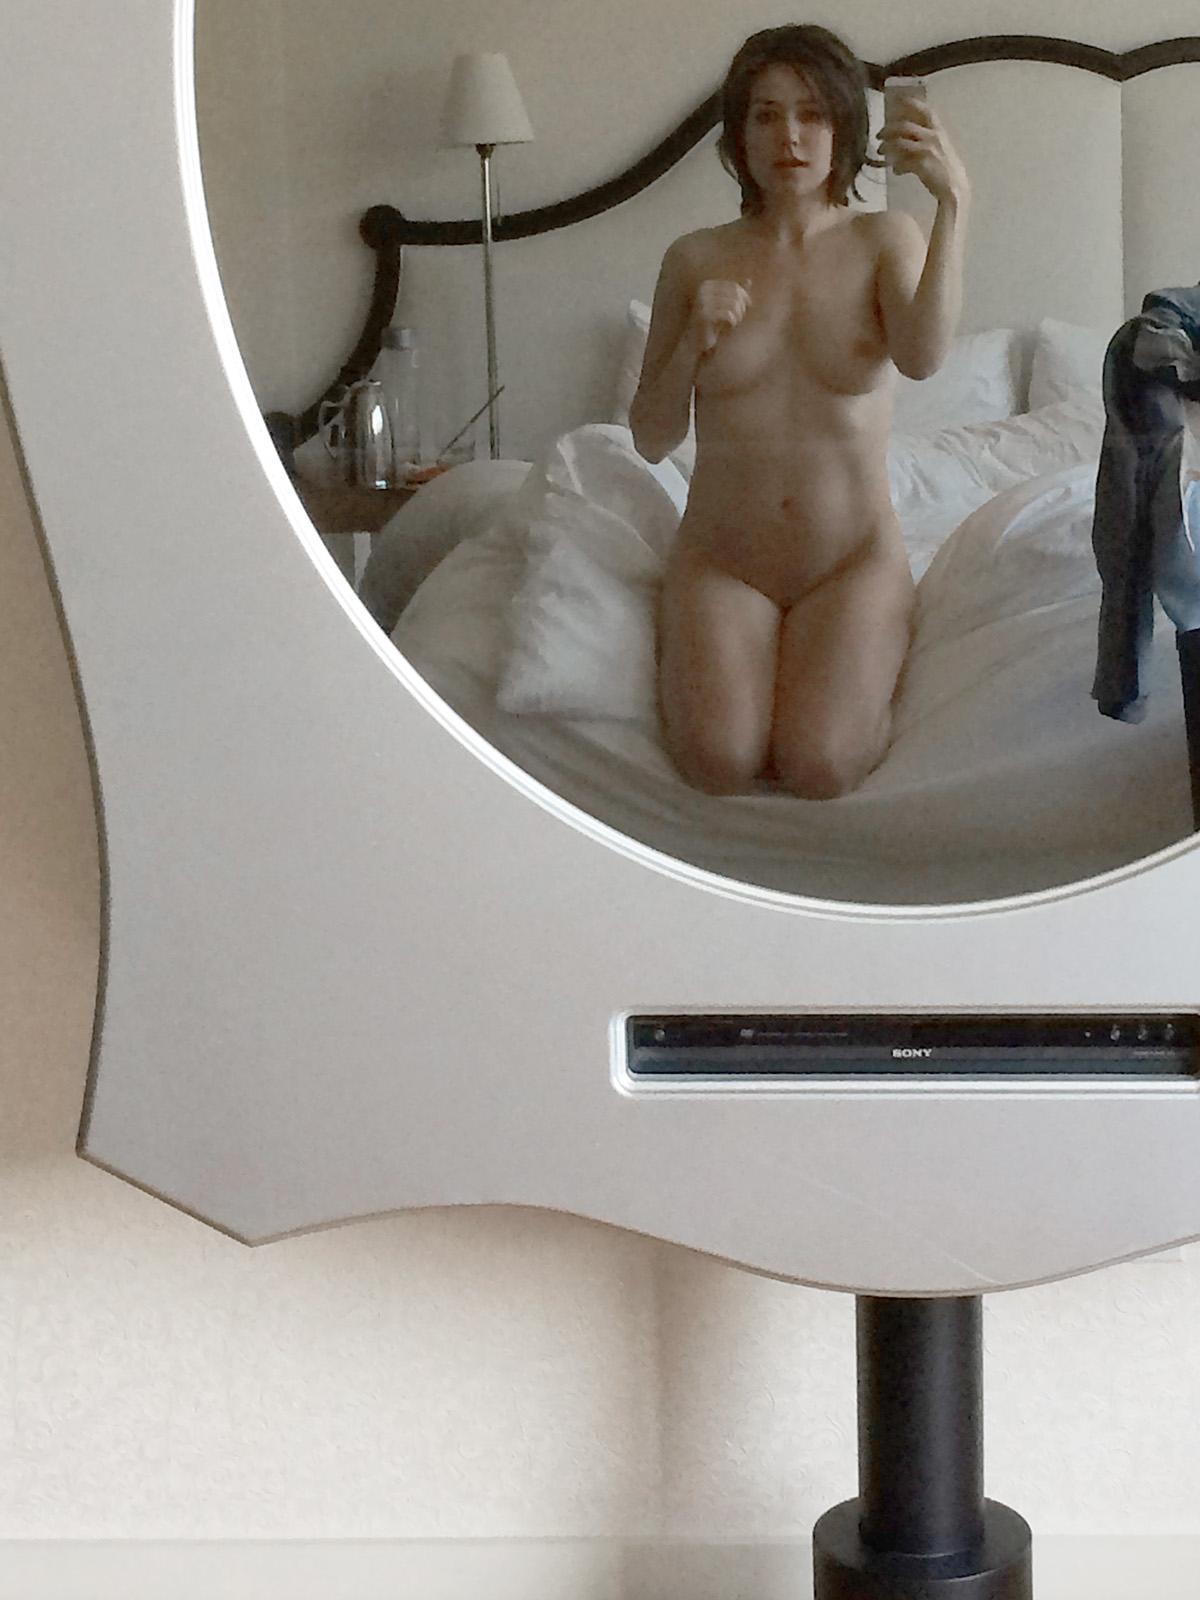 Megan Boone nude selfies leaked The Fappening 2018